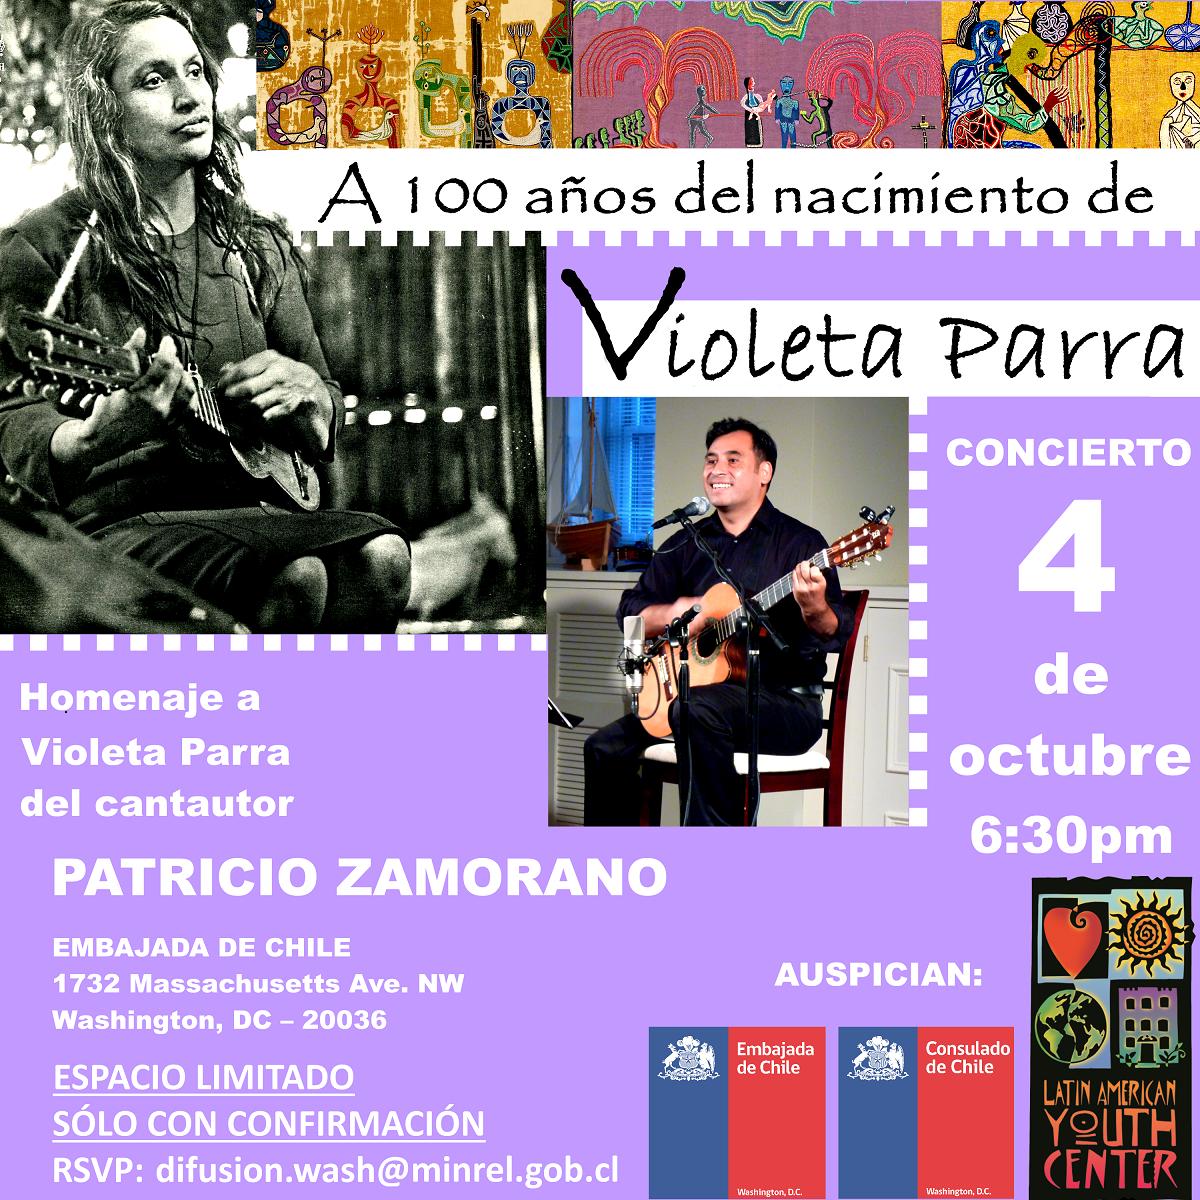 Homenaje Violeta Parra Oct 4 2017 Patricio Zamorano 1200px_new